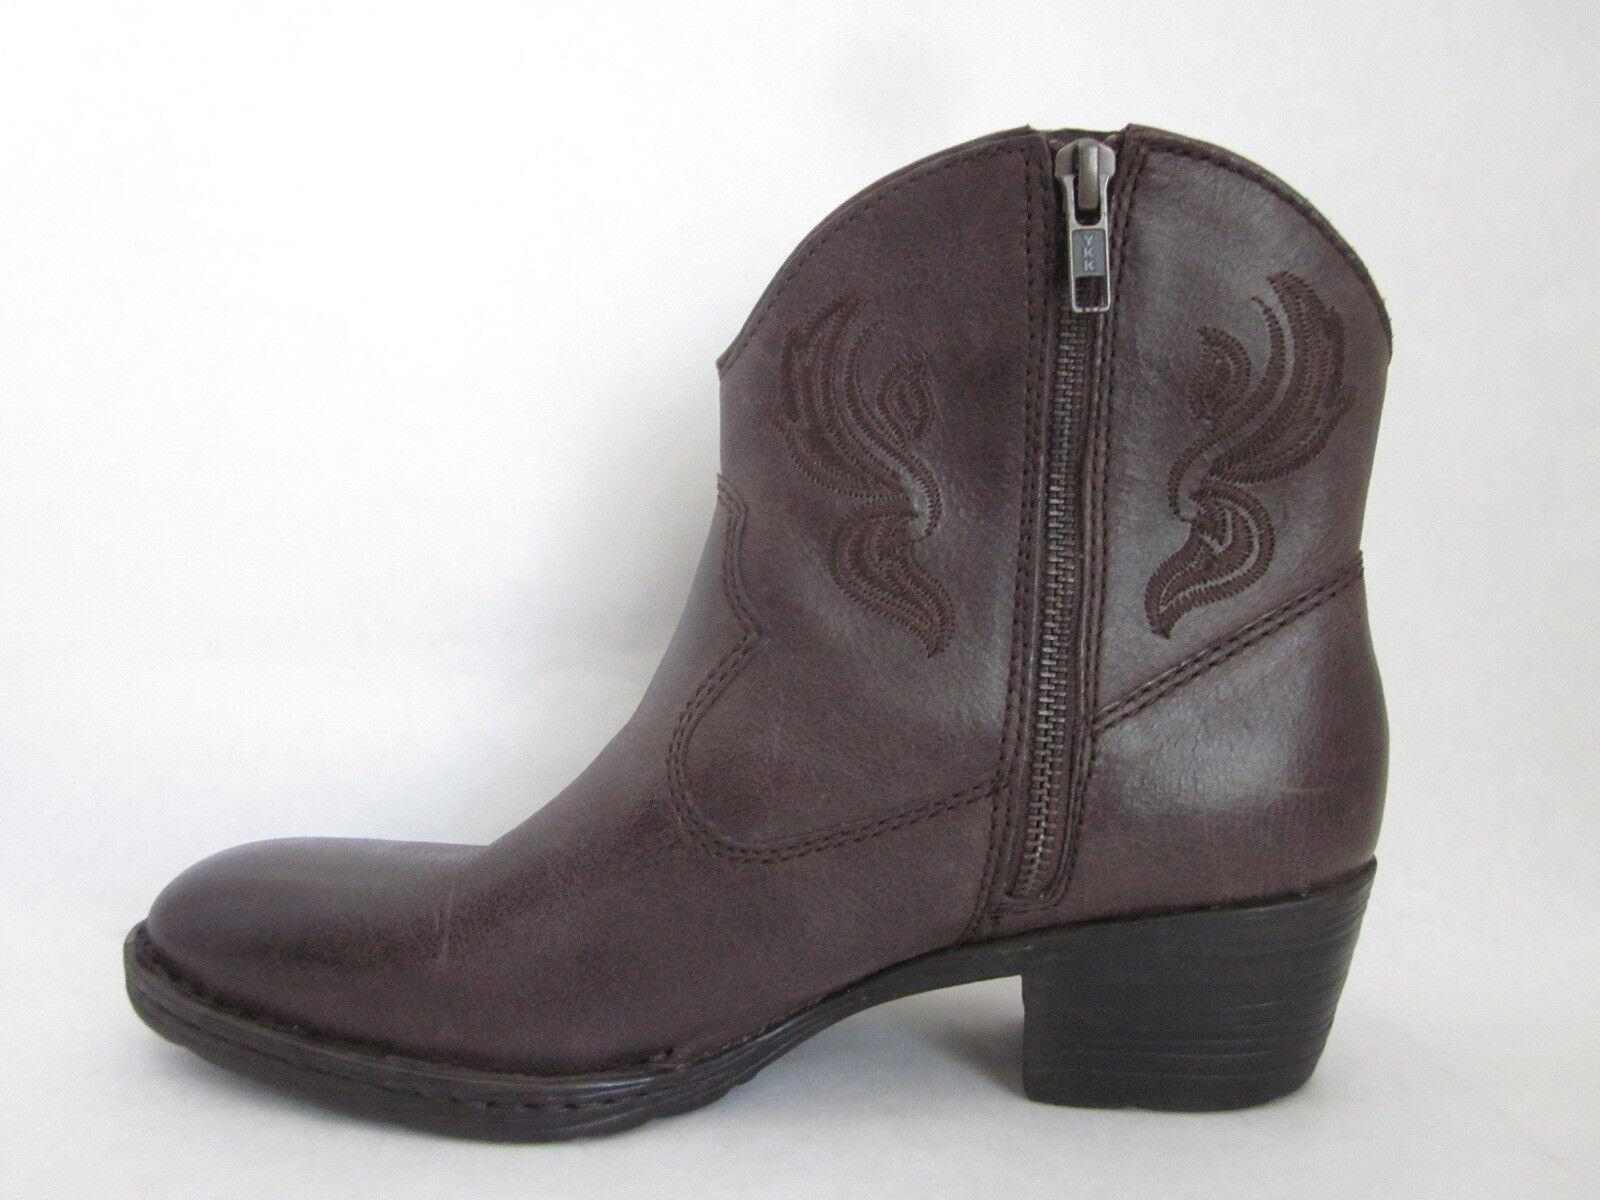 Born Riven Ebony (Brown) Western Cowboy Boots SIZE SIZE